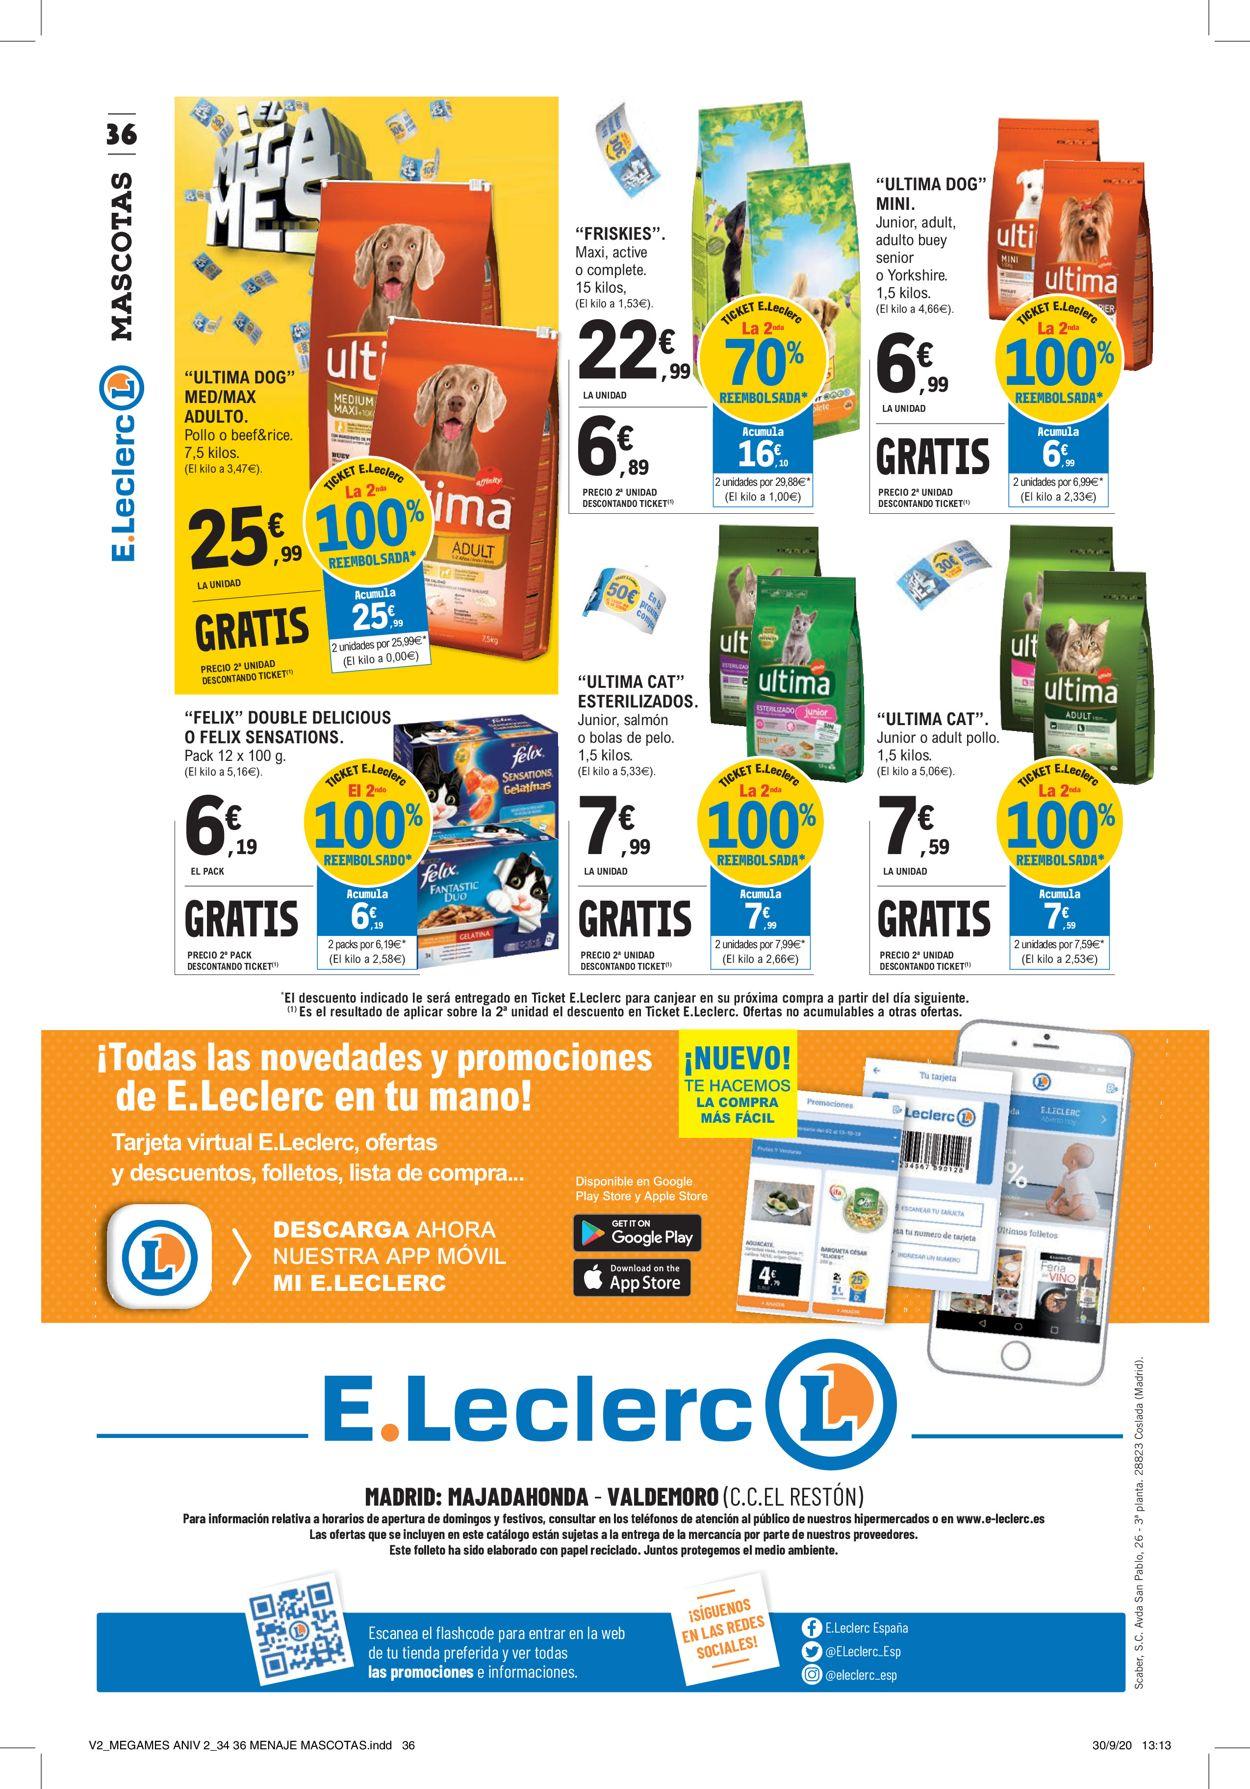 E.leclerc Folleto - 12.10-25.10.2020 (Página 36)